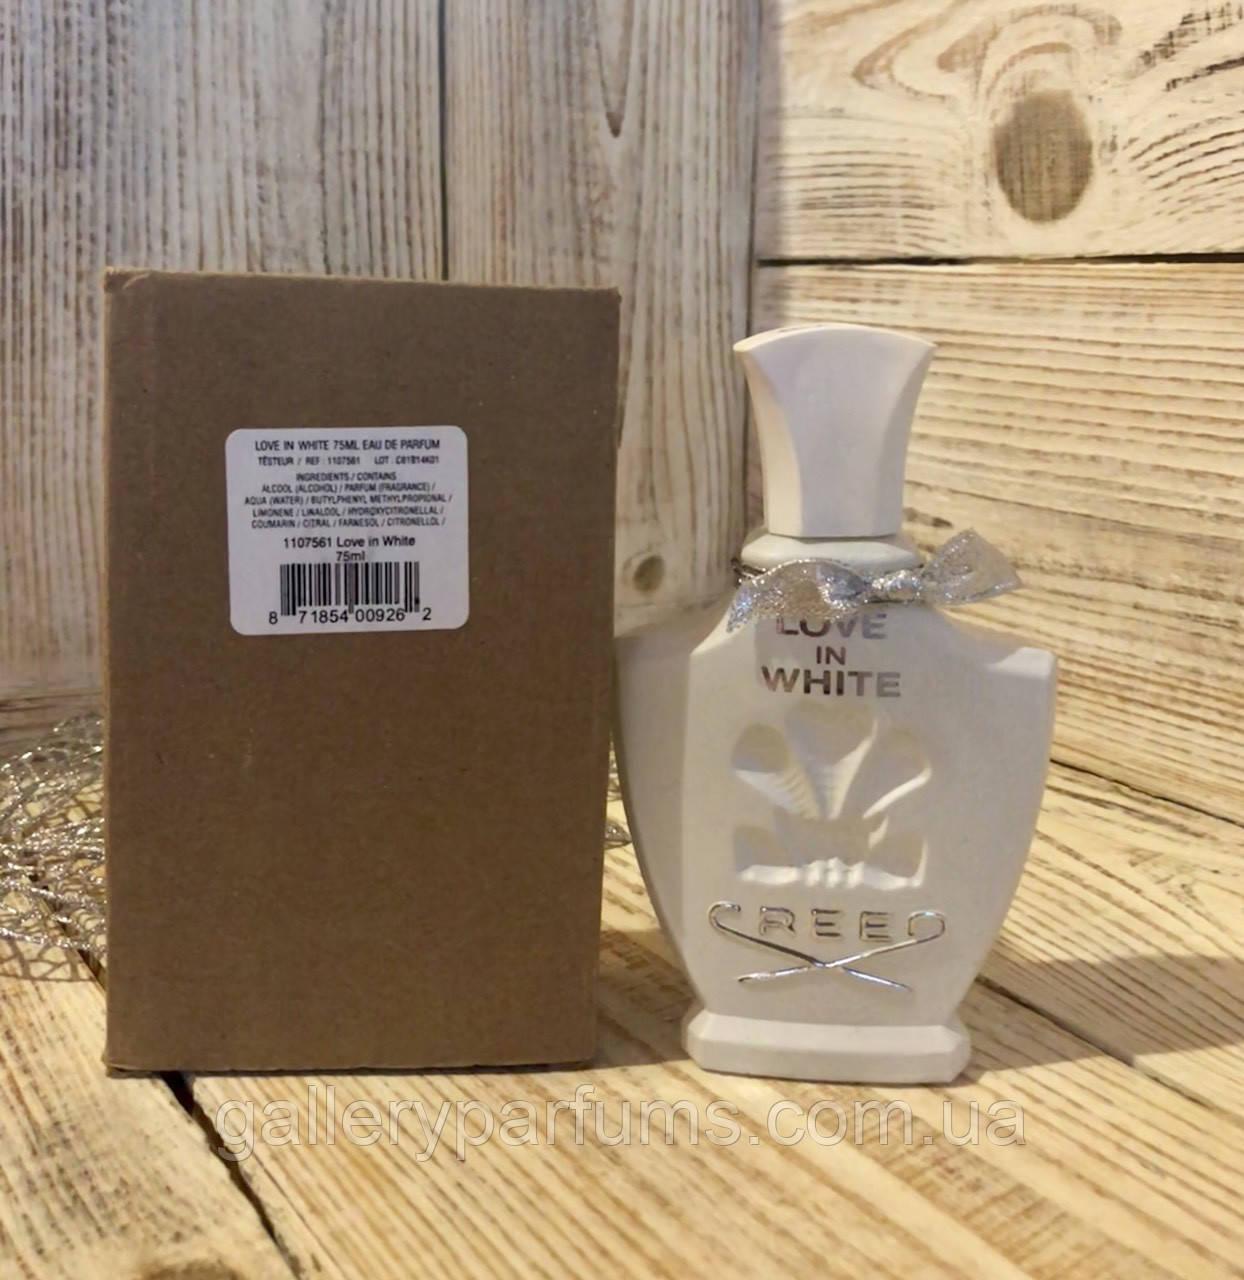 духи тестер Creed Love In White Eau De Parfum 75 Ml цена 585 грн